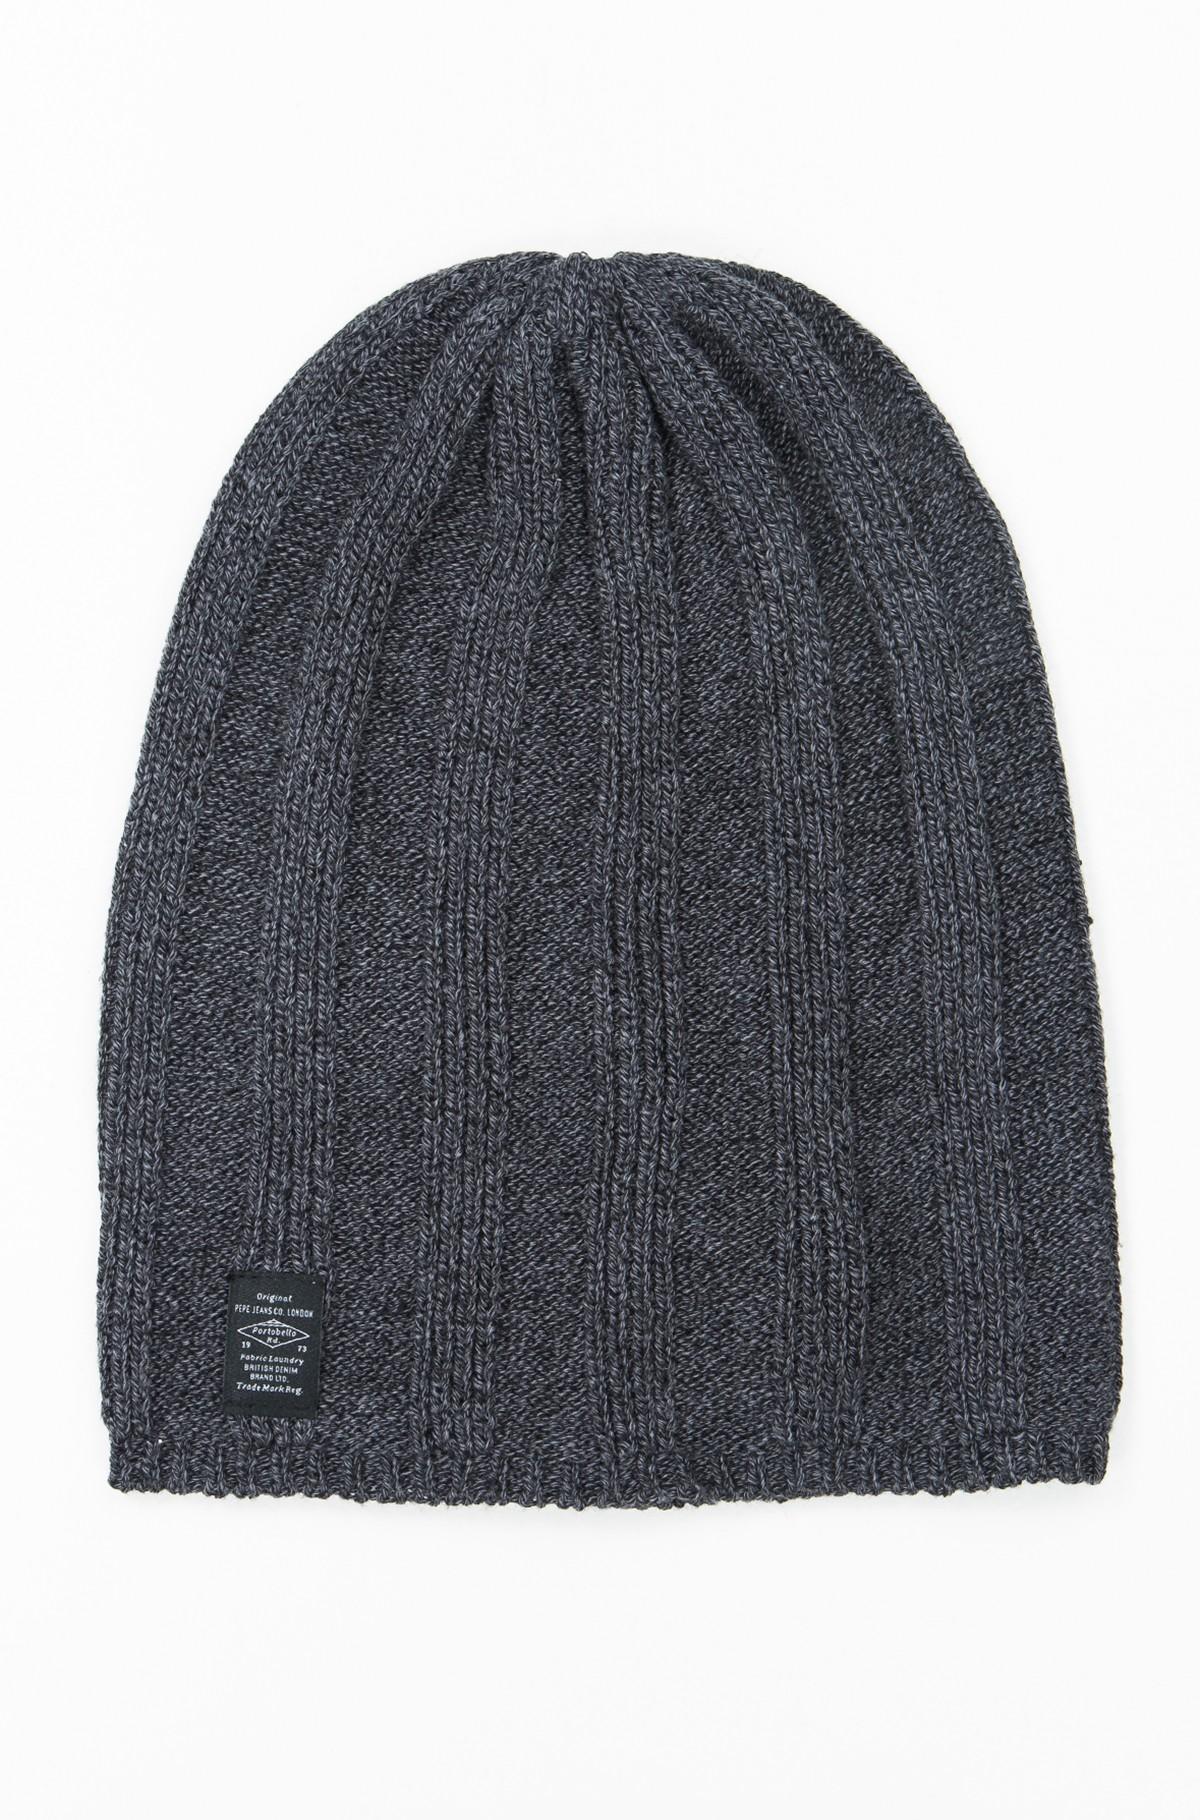 Kepurė OWILLOW HAT/PM040415-full-1